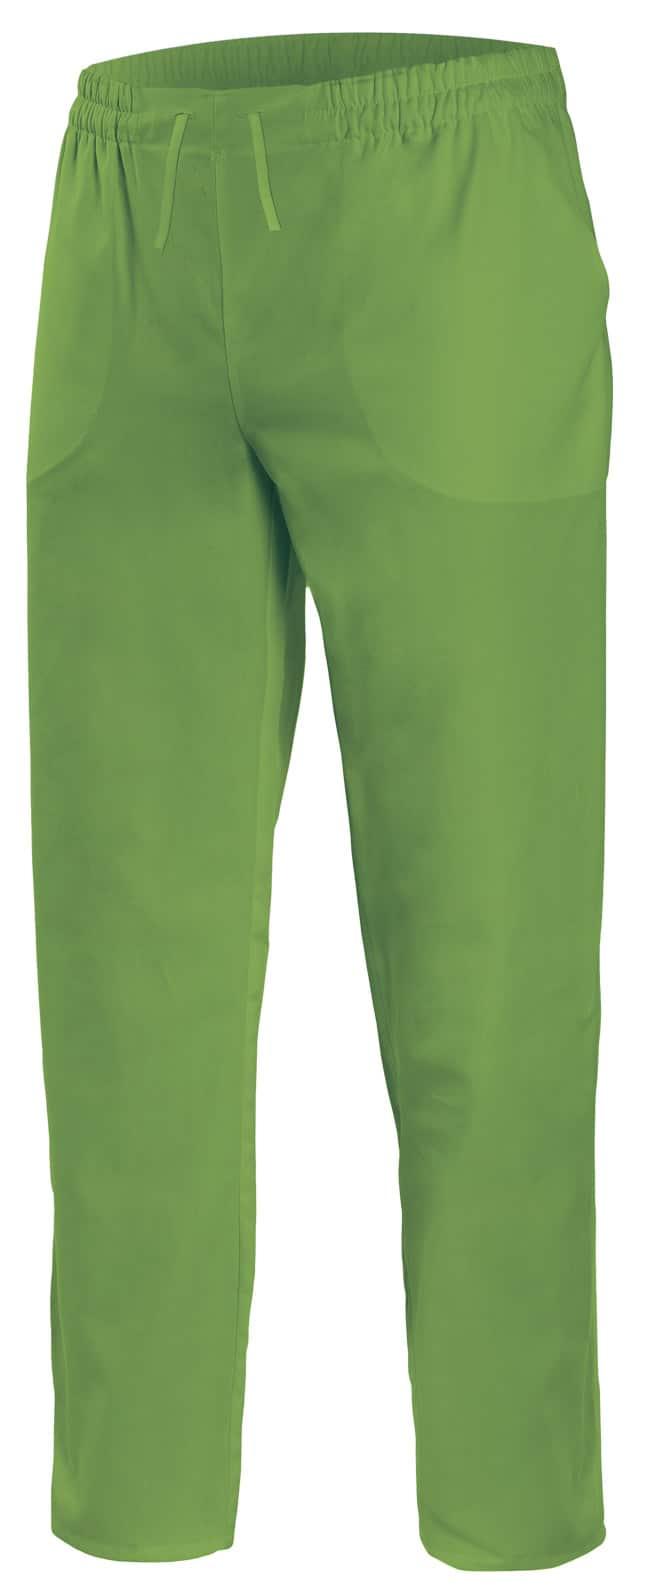 Velilla 533001 PantalÓn Pijama Con Cintas Verde Lima